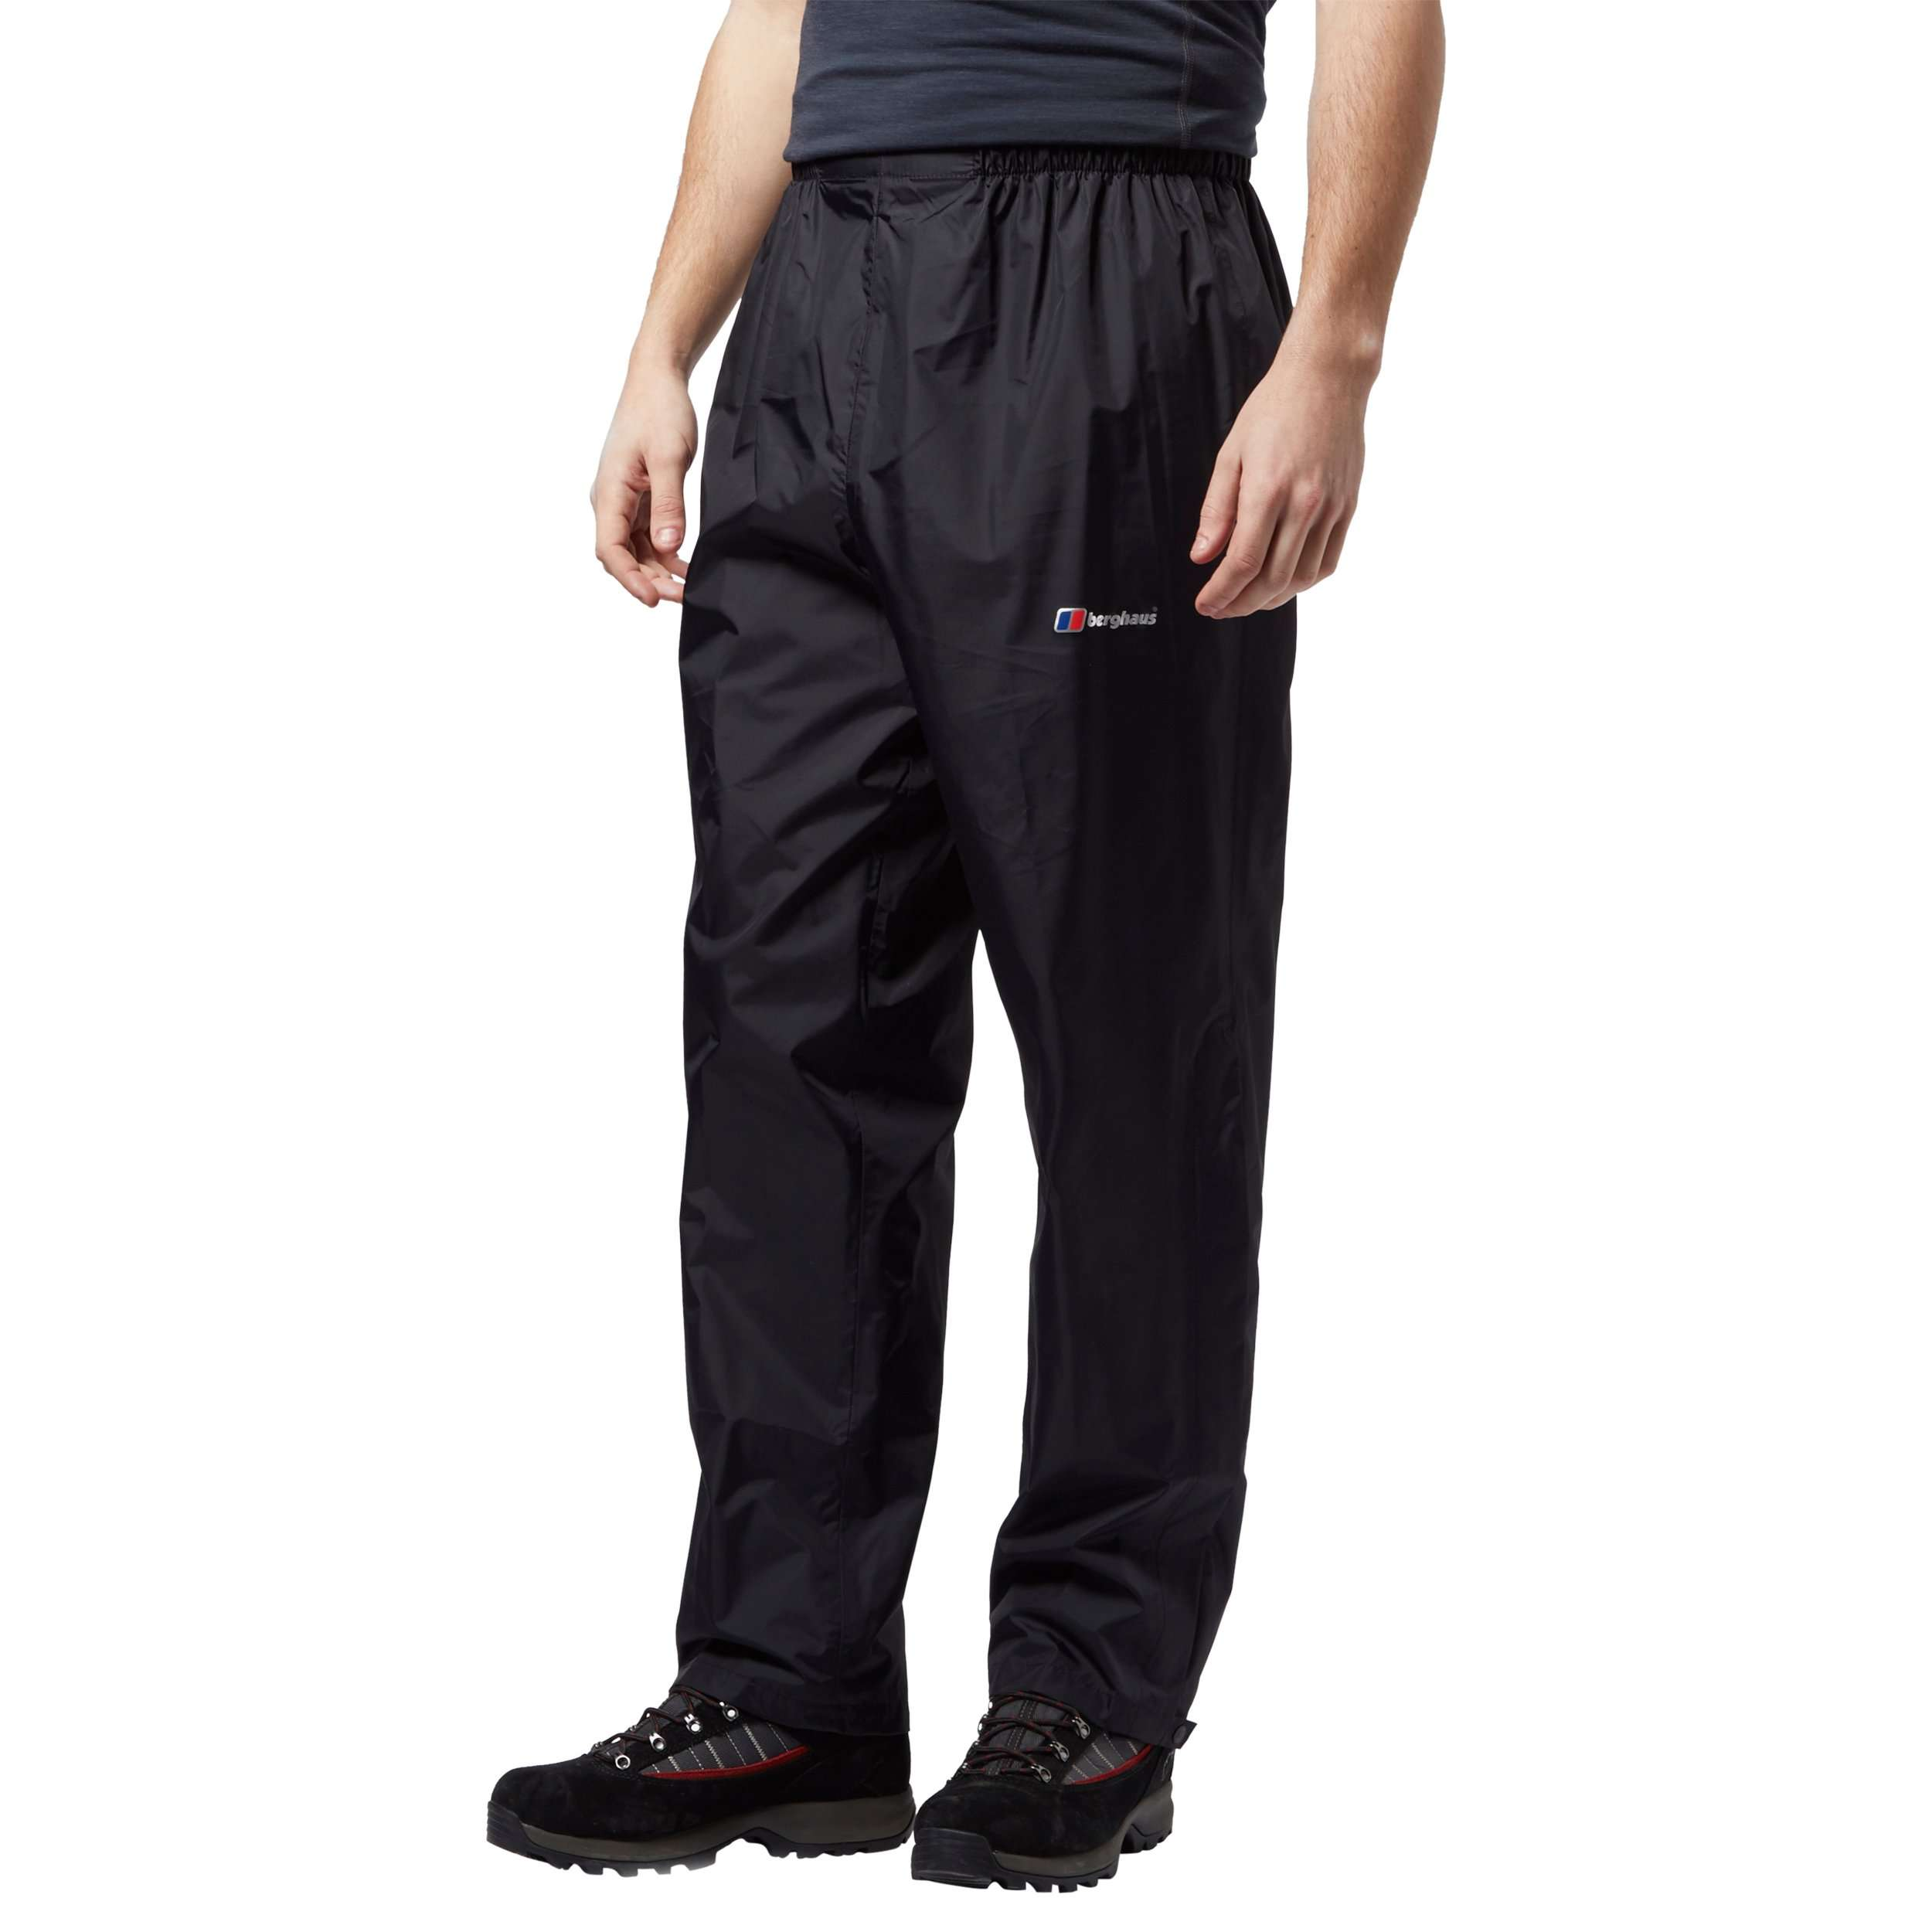 BERGHAUS Men's Stratus Waterproof Pants